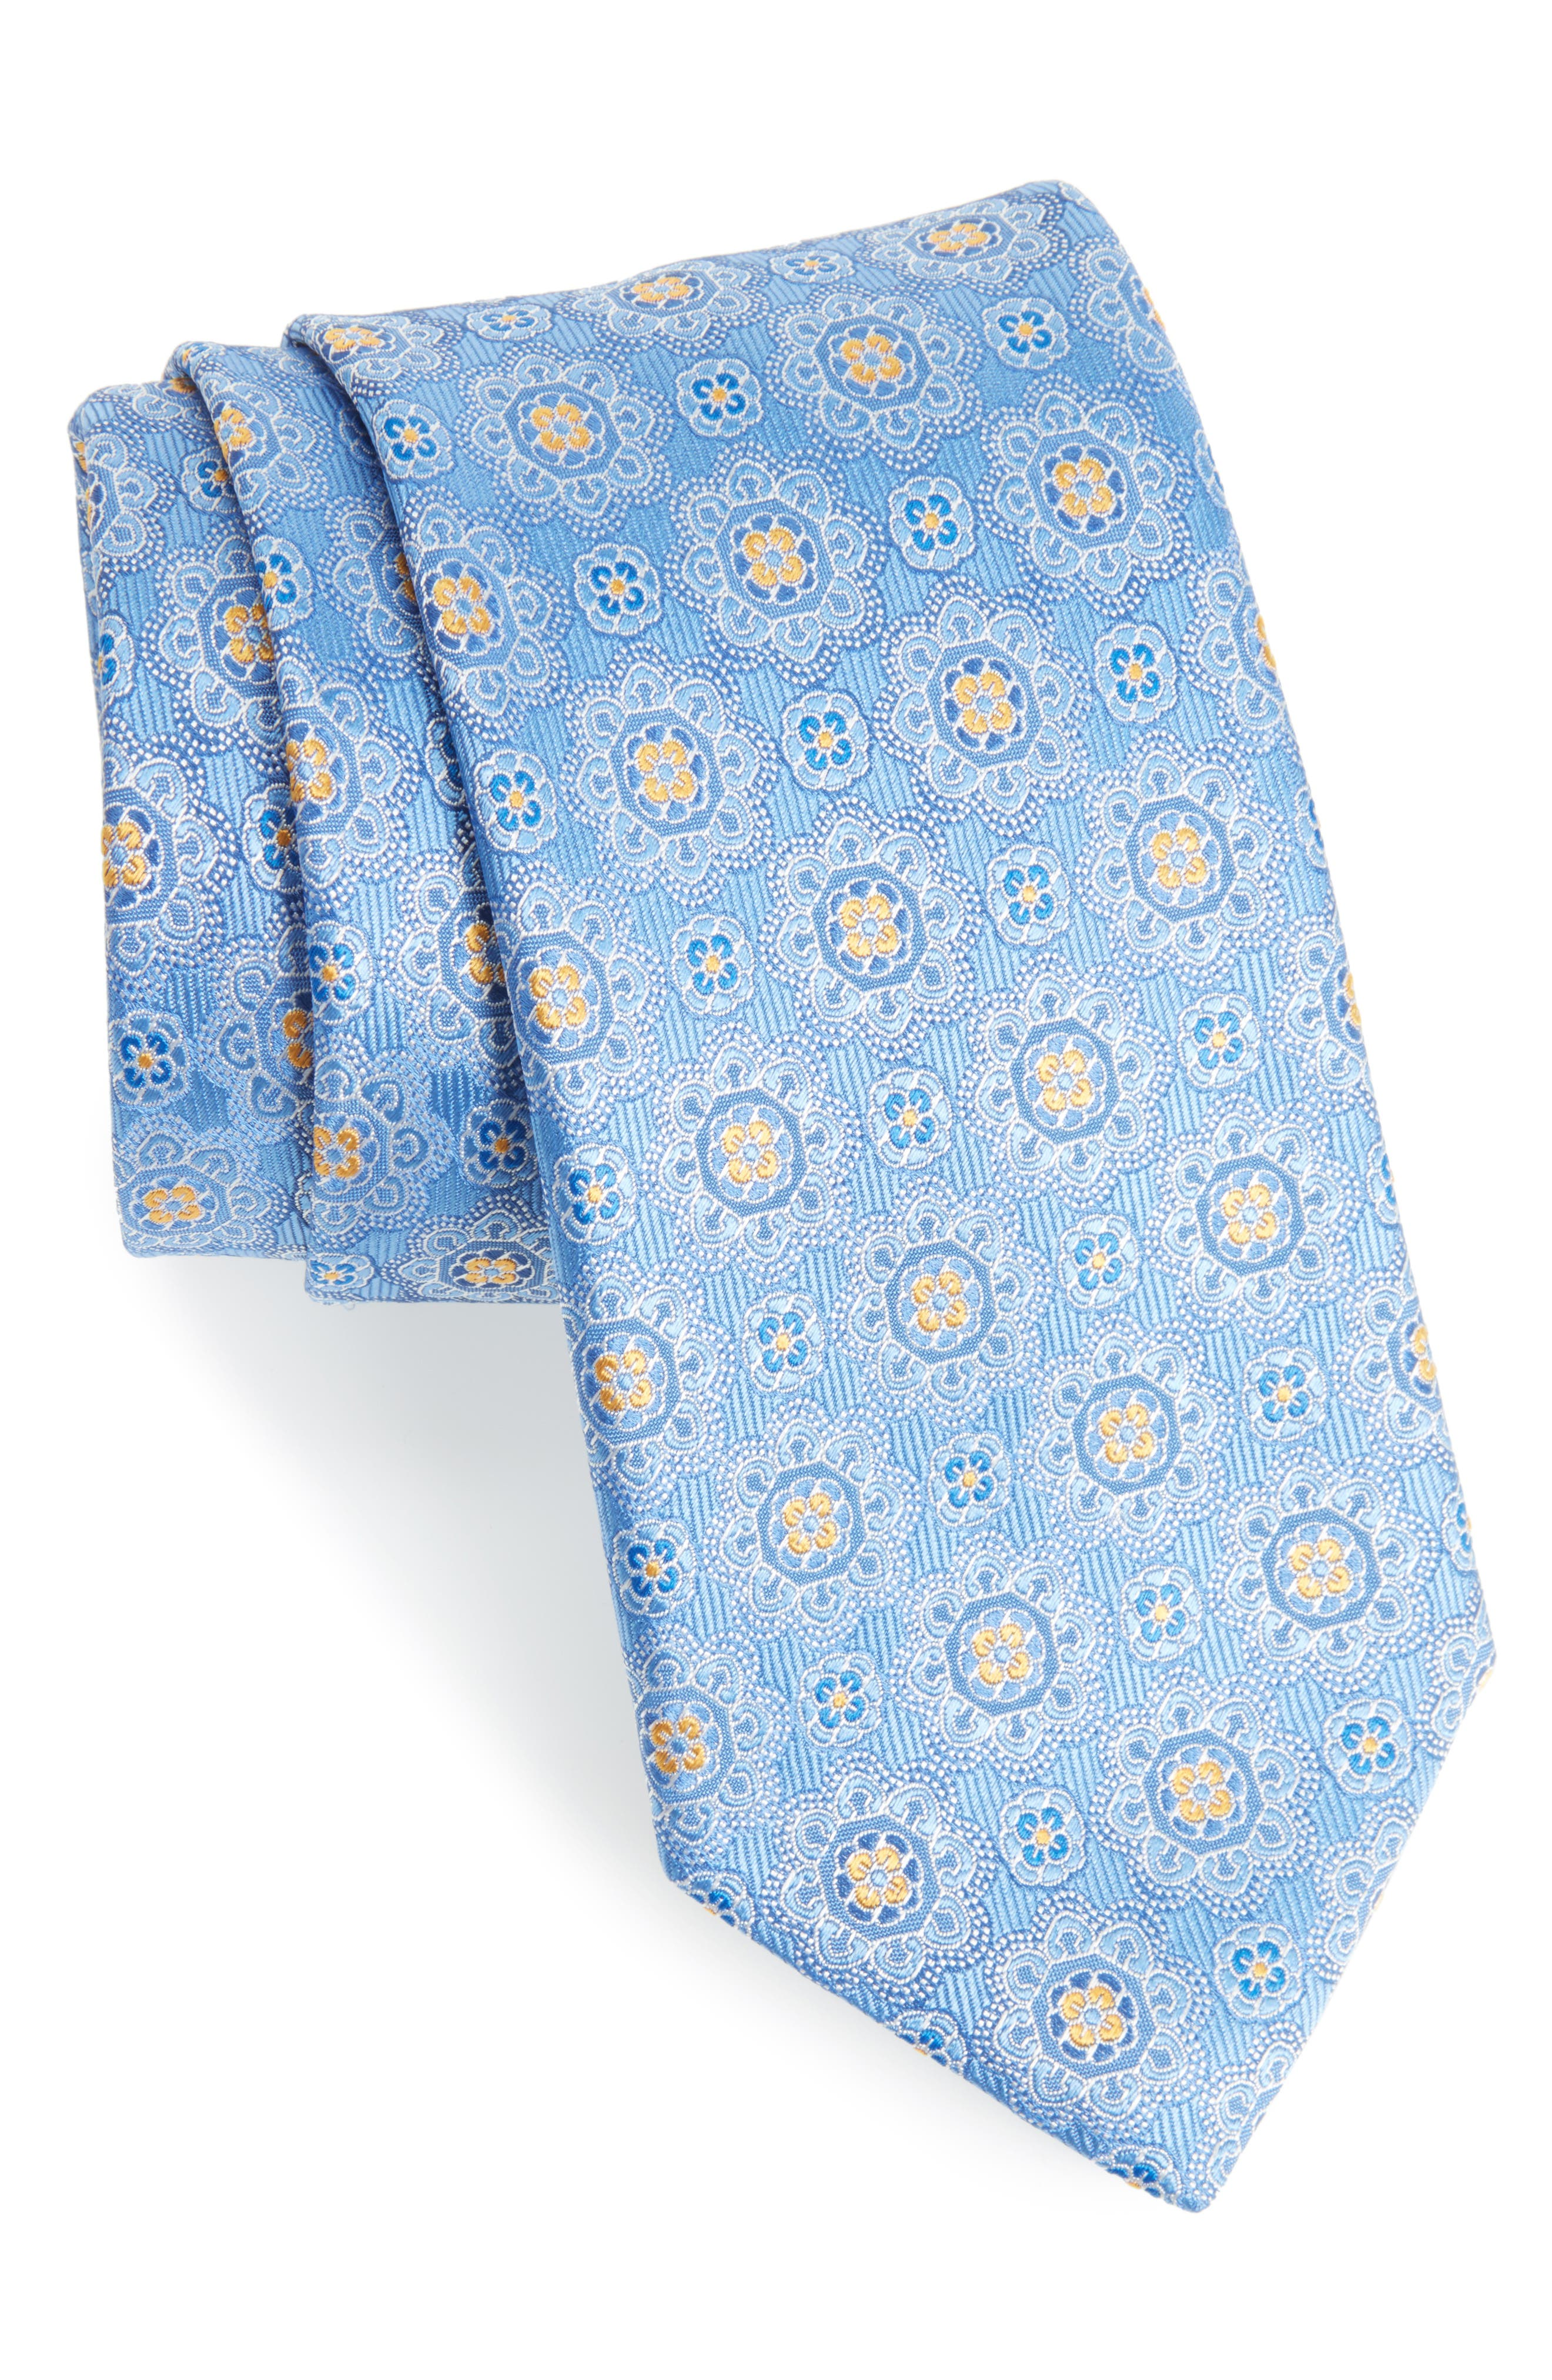 Medallion Silk Tie,                             Main thumbnail 1, color,                             330